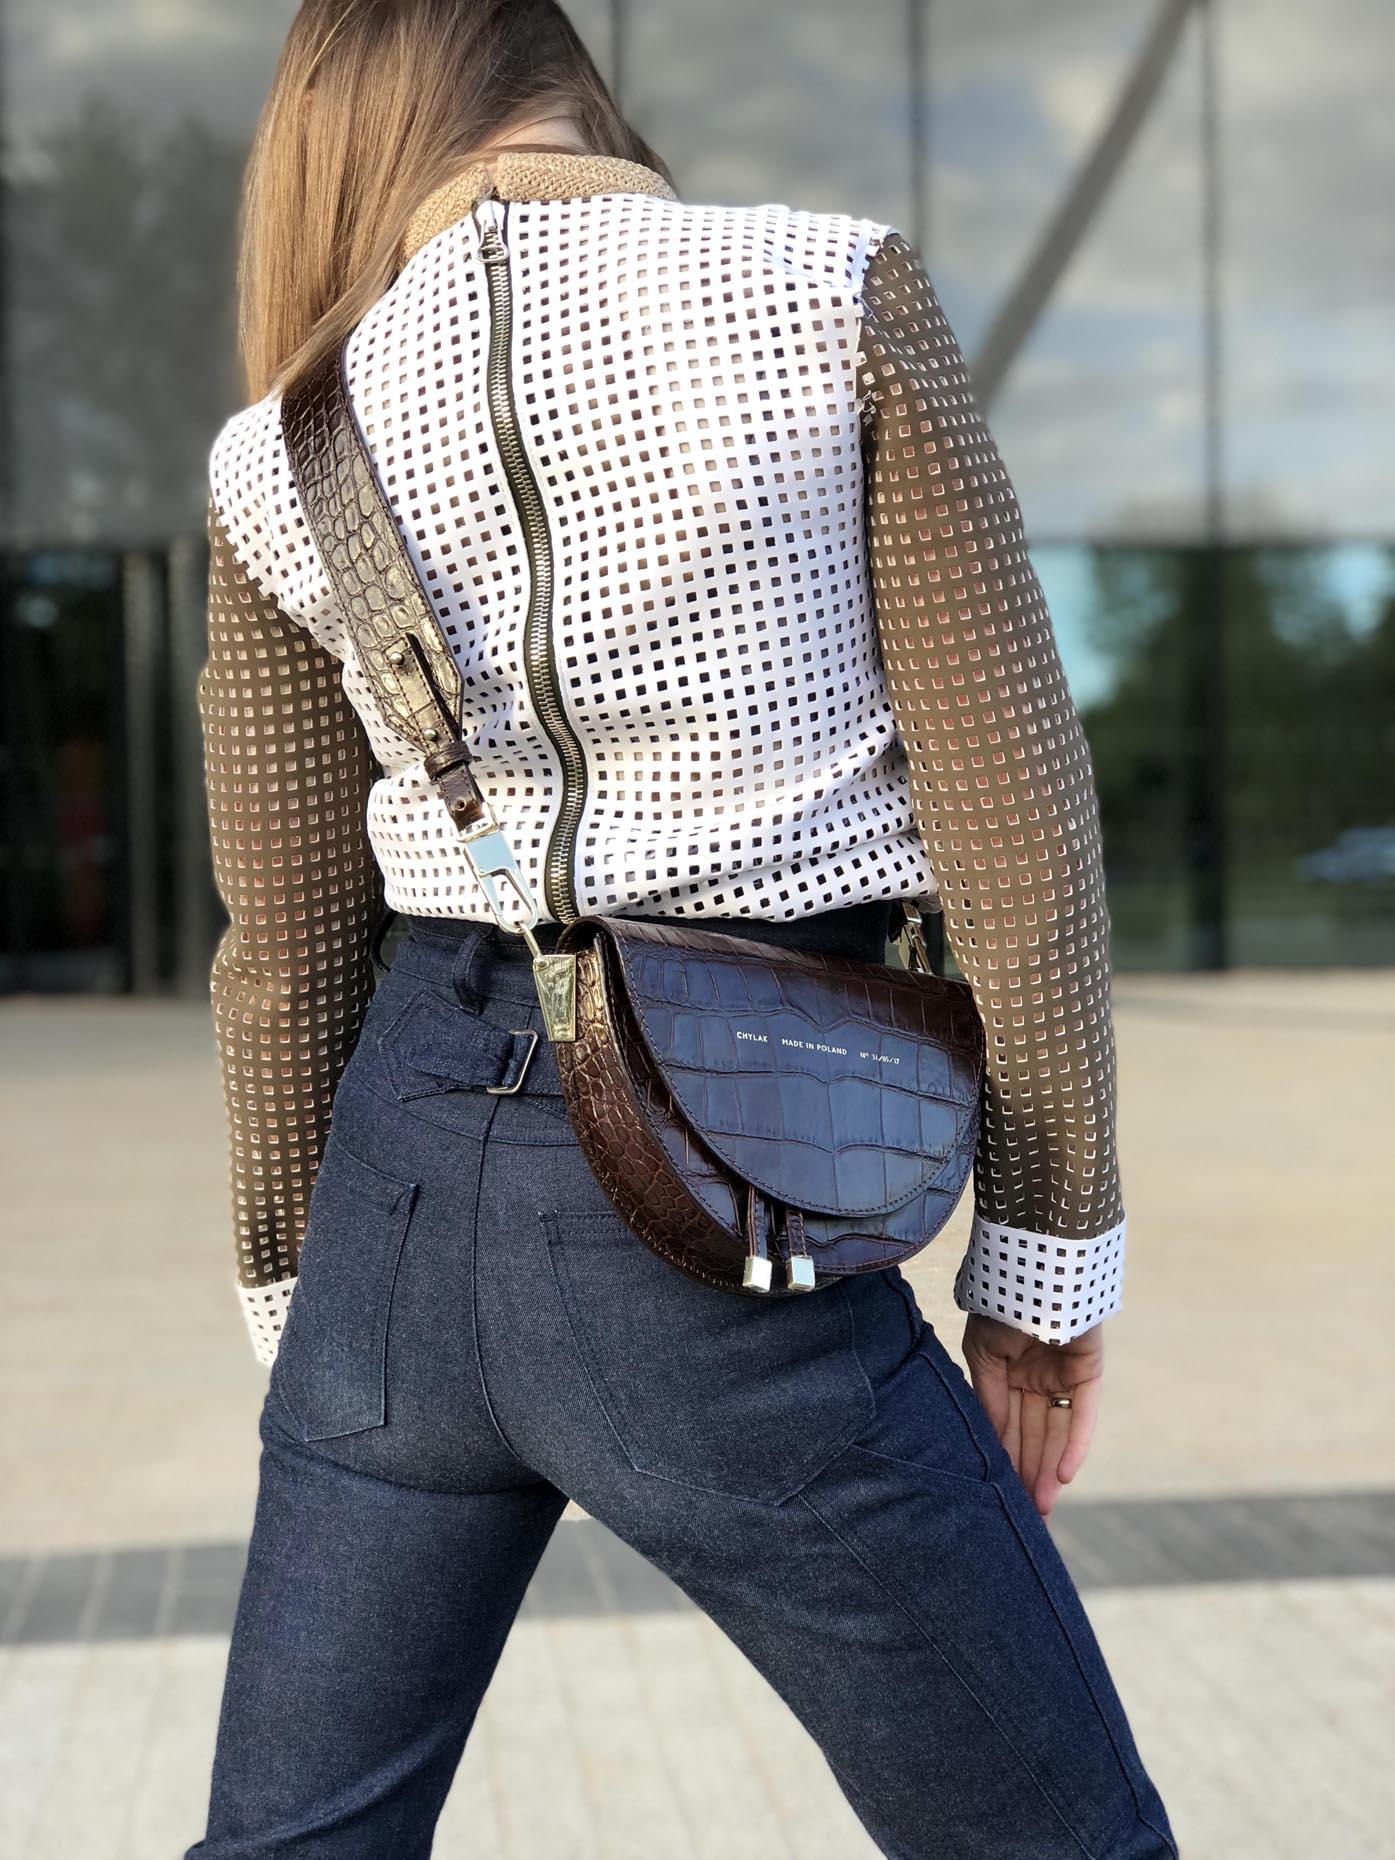 flared acne jeans, jw anderson top, saddle bag zofia chylak by Fashion Art Media